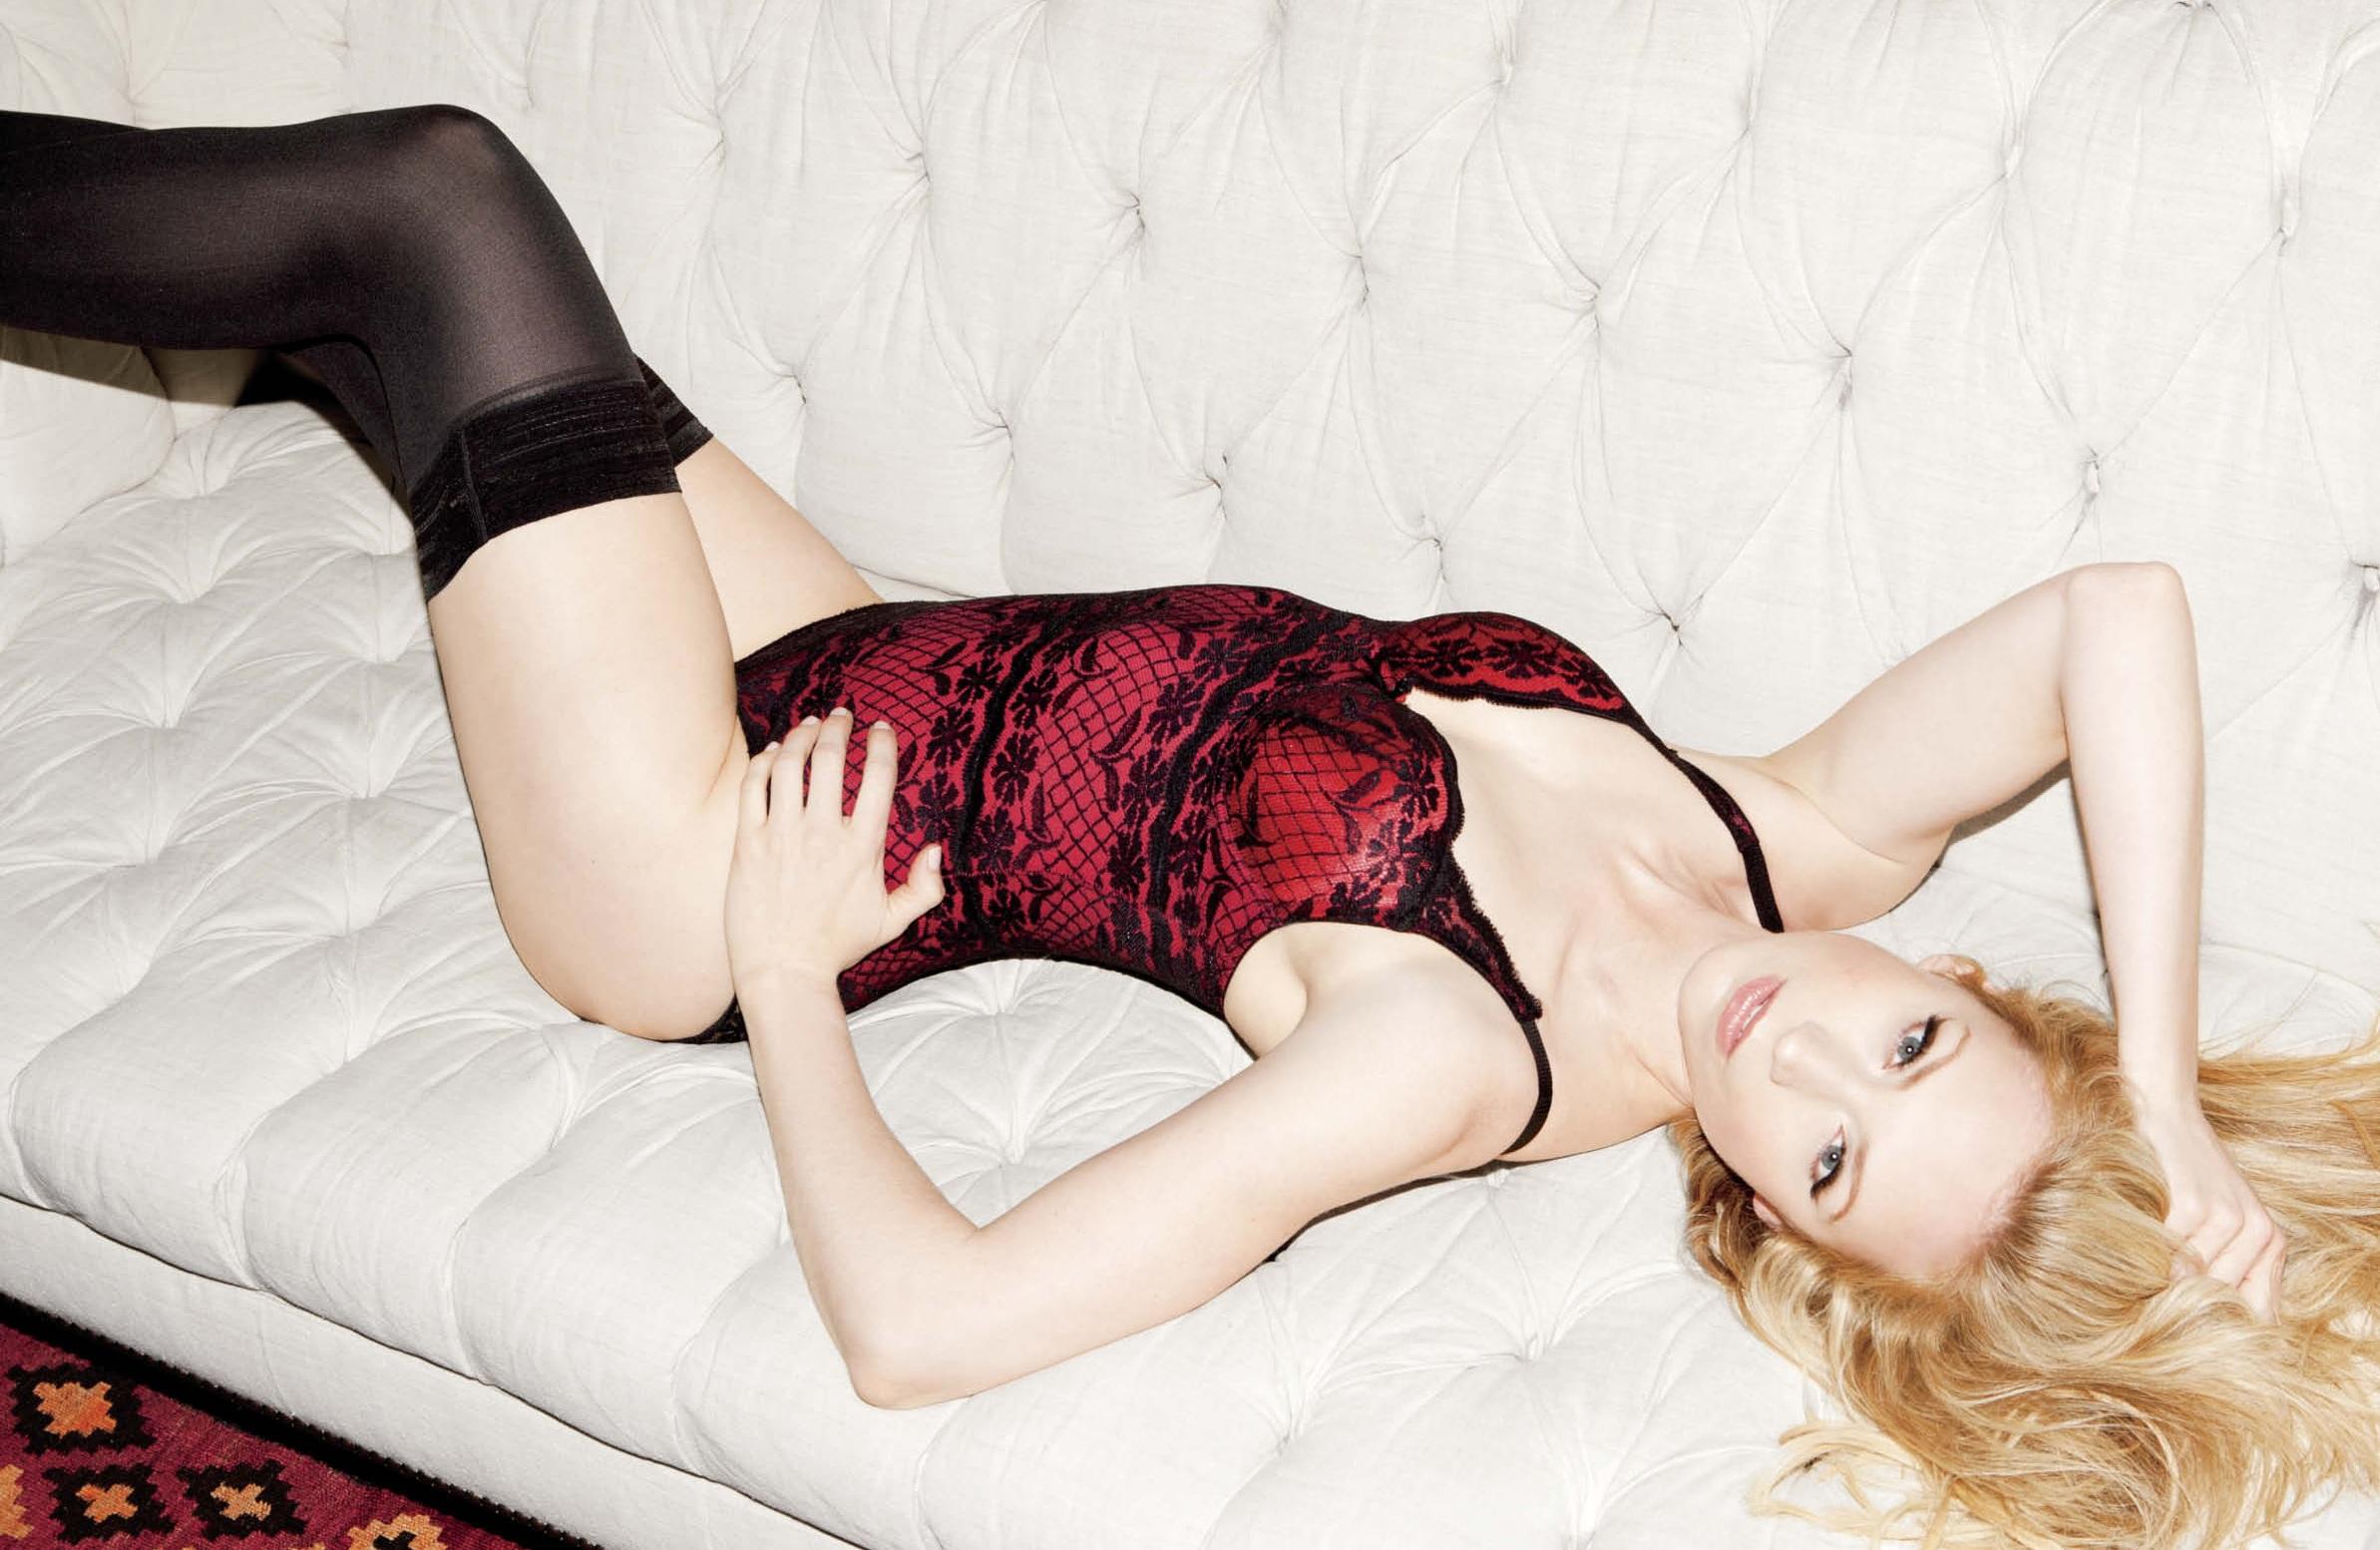 Beth Riesgraf Maxim USA Magazine